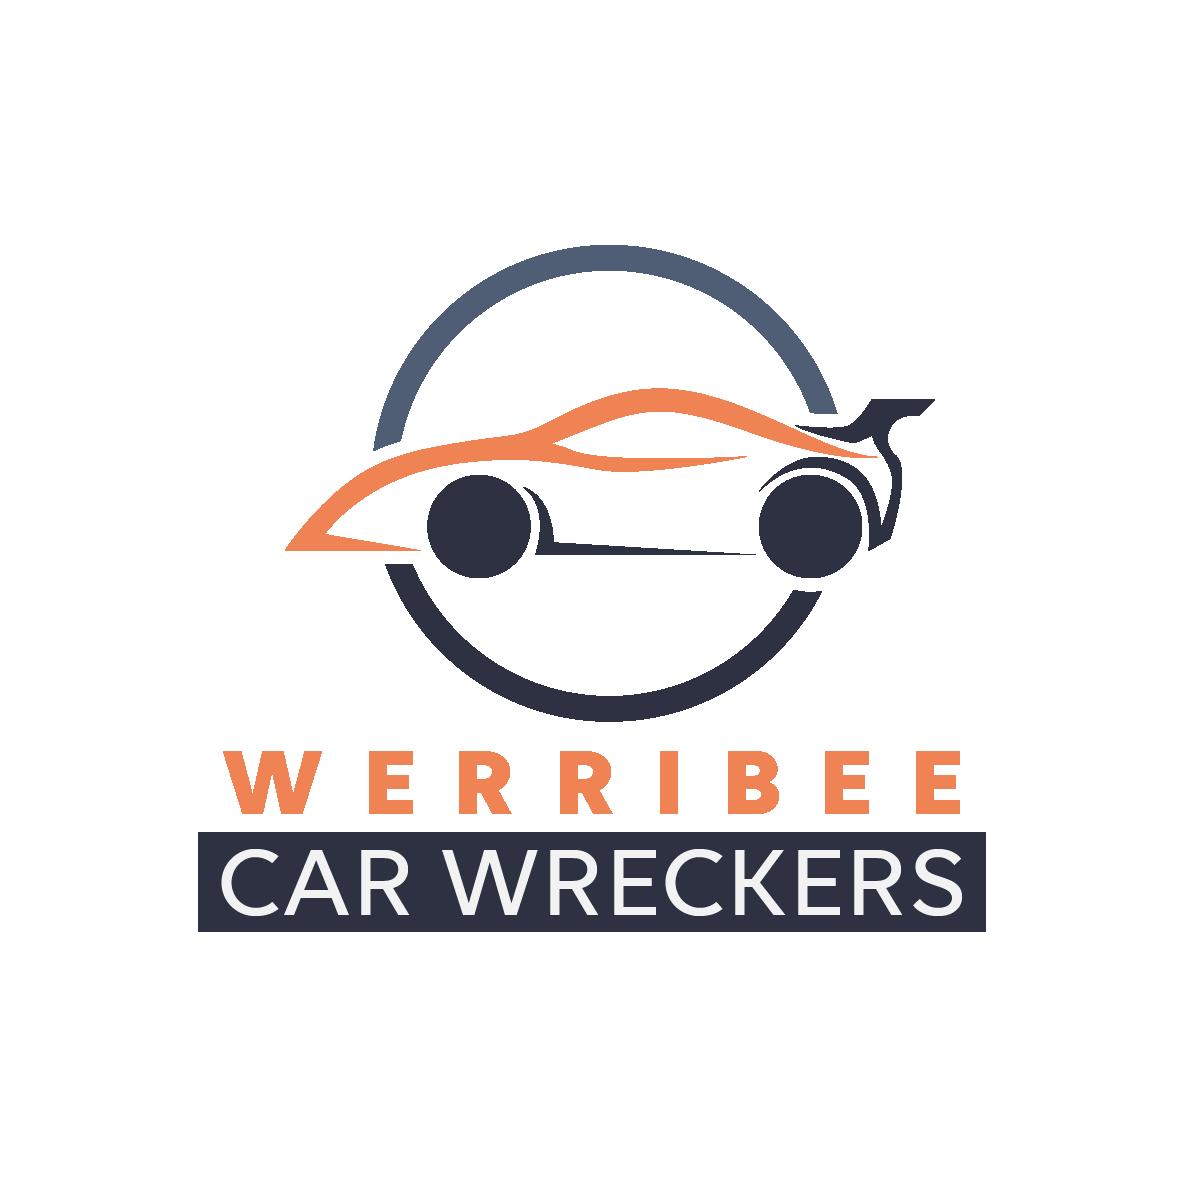 Werribee Car Wreckers